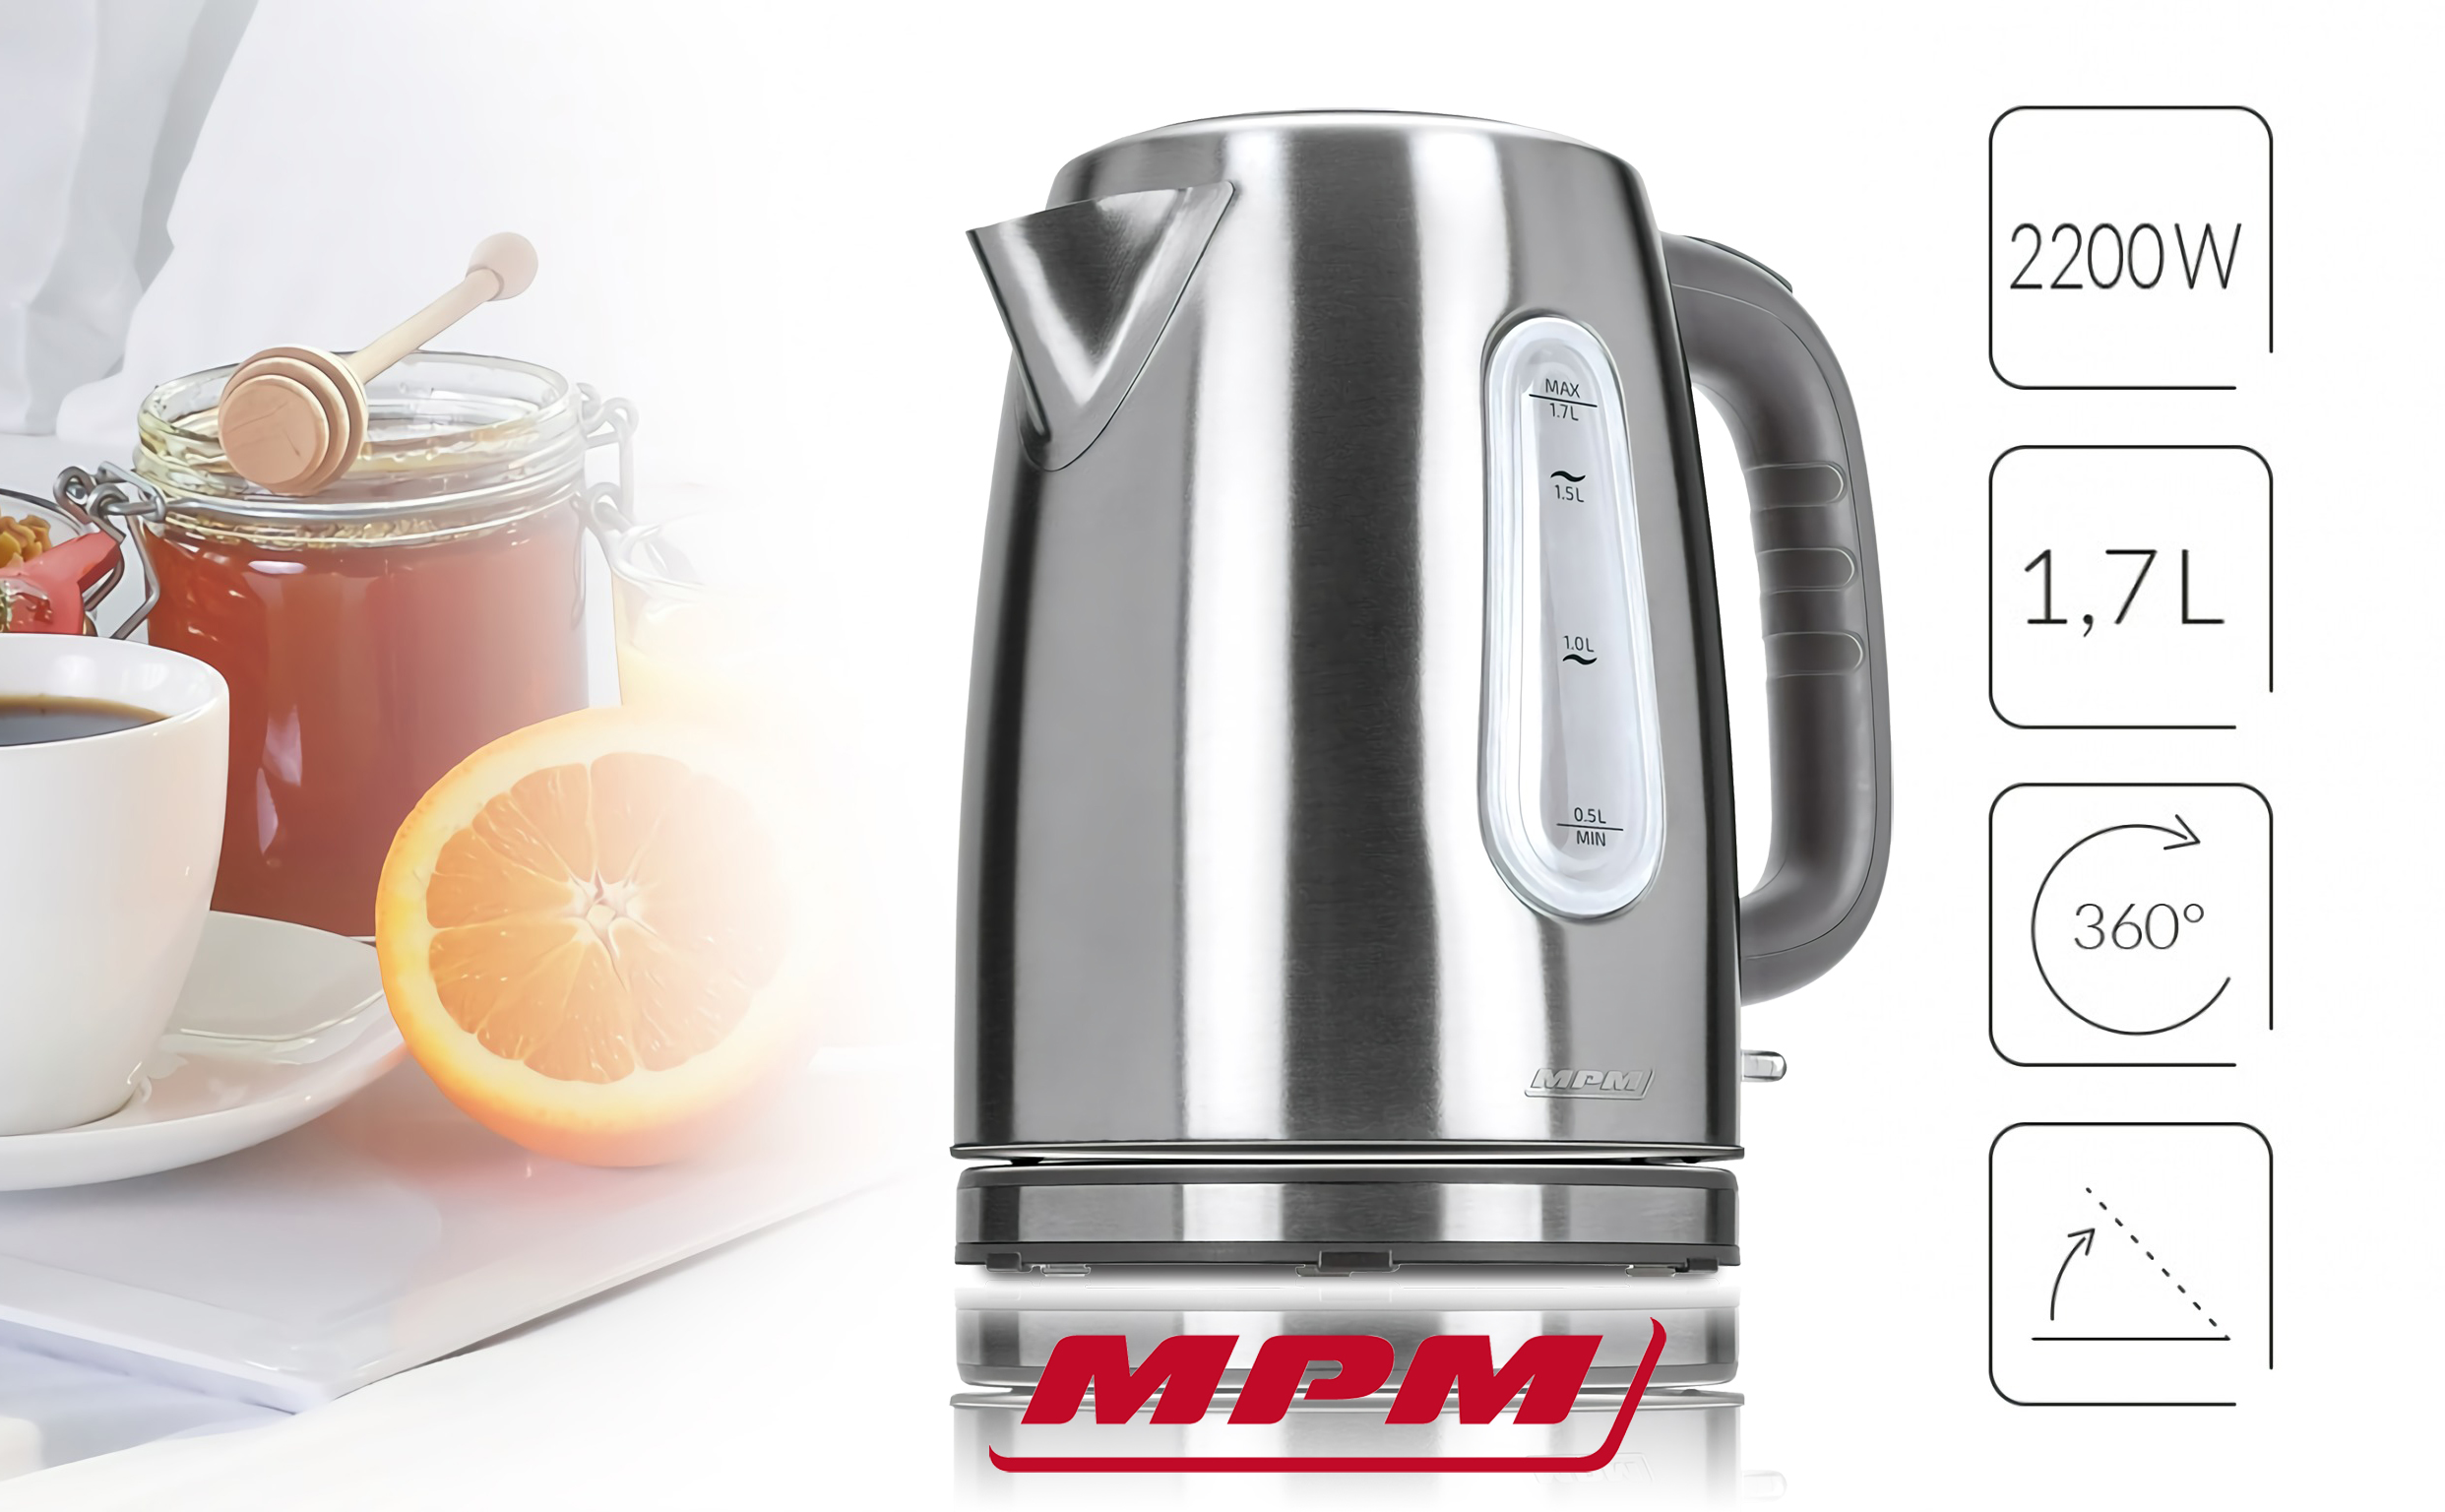 MPM MCZ-68M Hervidor De Agua Eléctrico de Acero Inoxidable. 1,7 Litros, Tapa automática, Filtro Anti cal, Base 360º, 2200w